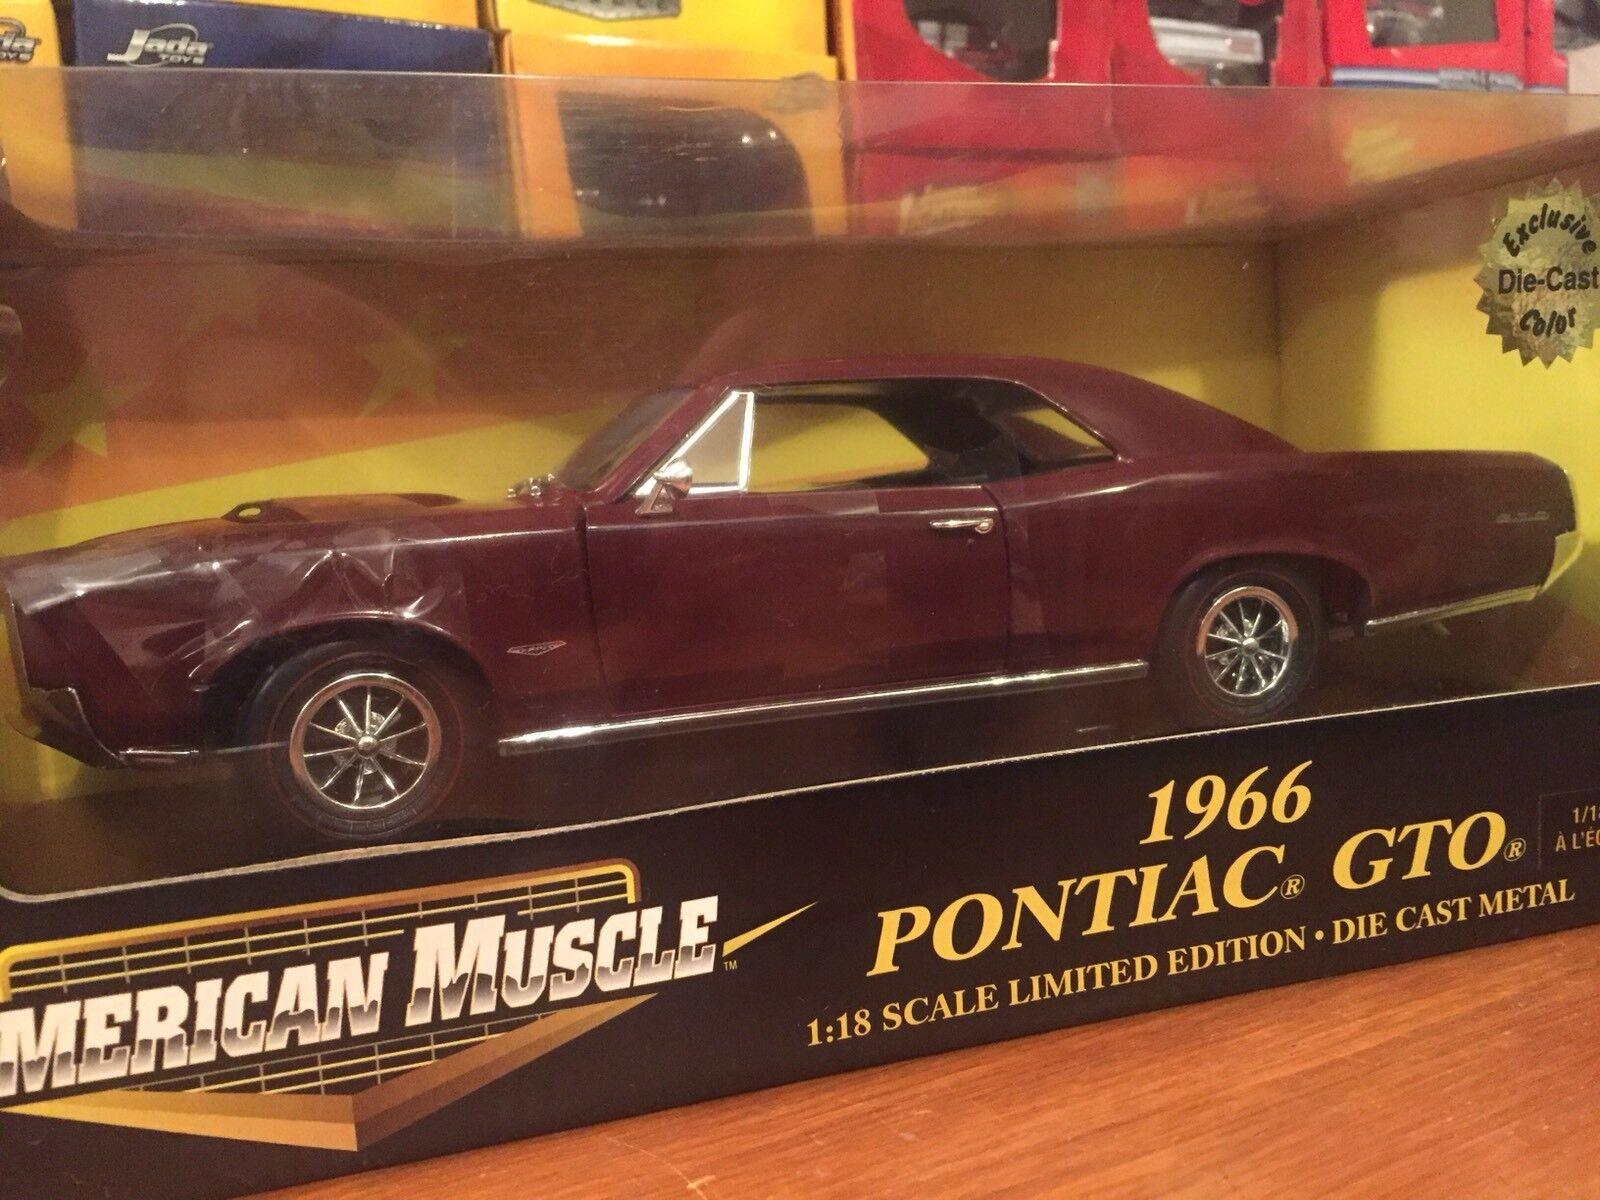 ahorra hasta un 80% Ertl 1 18 1966 Pontiac Gto Juguetesrus Juguetesrus Juguetesrus exclusivo Color. el artículo 32814  comprar marca